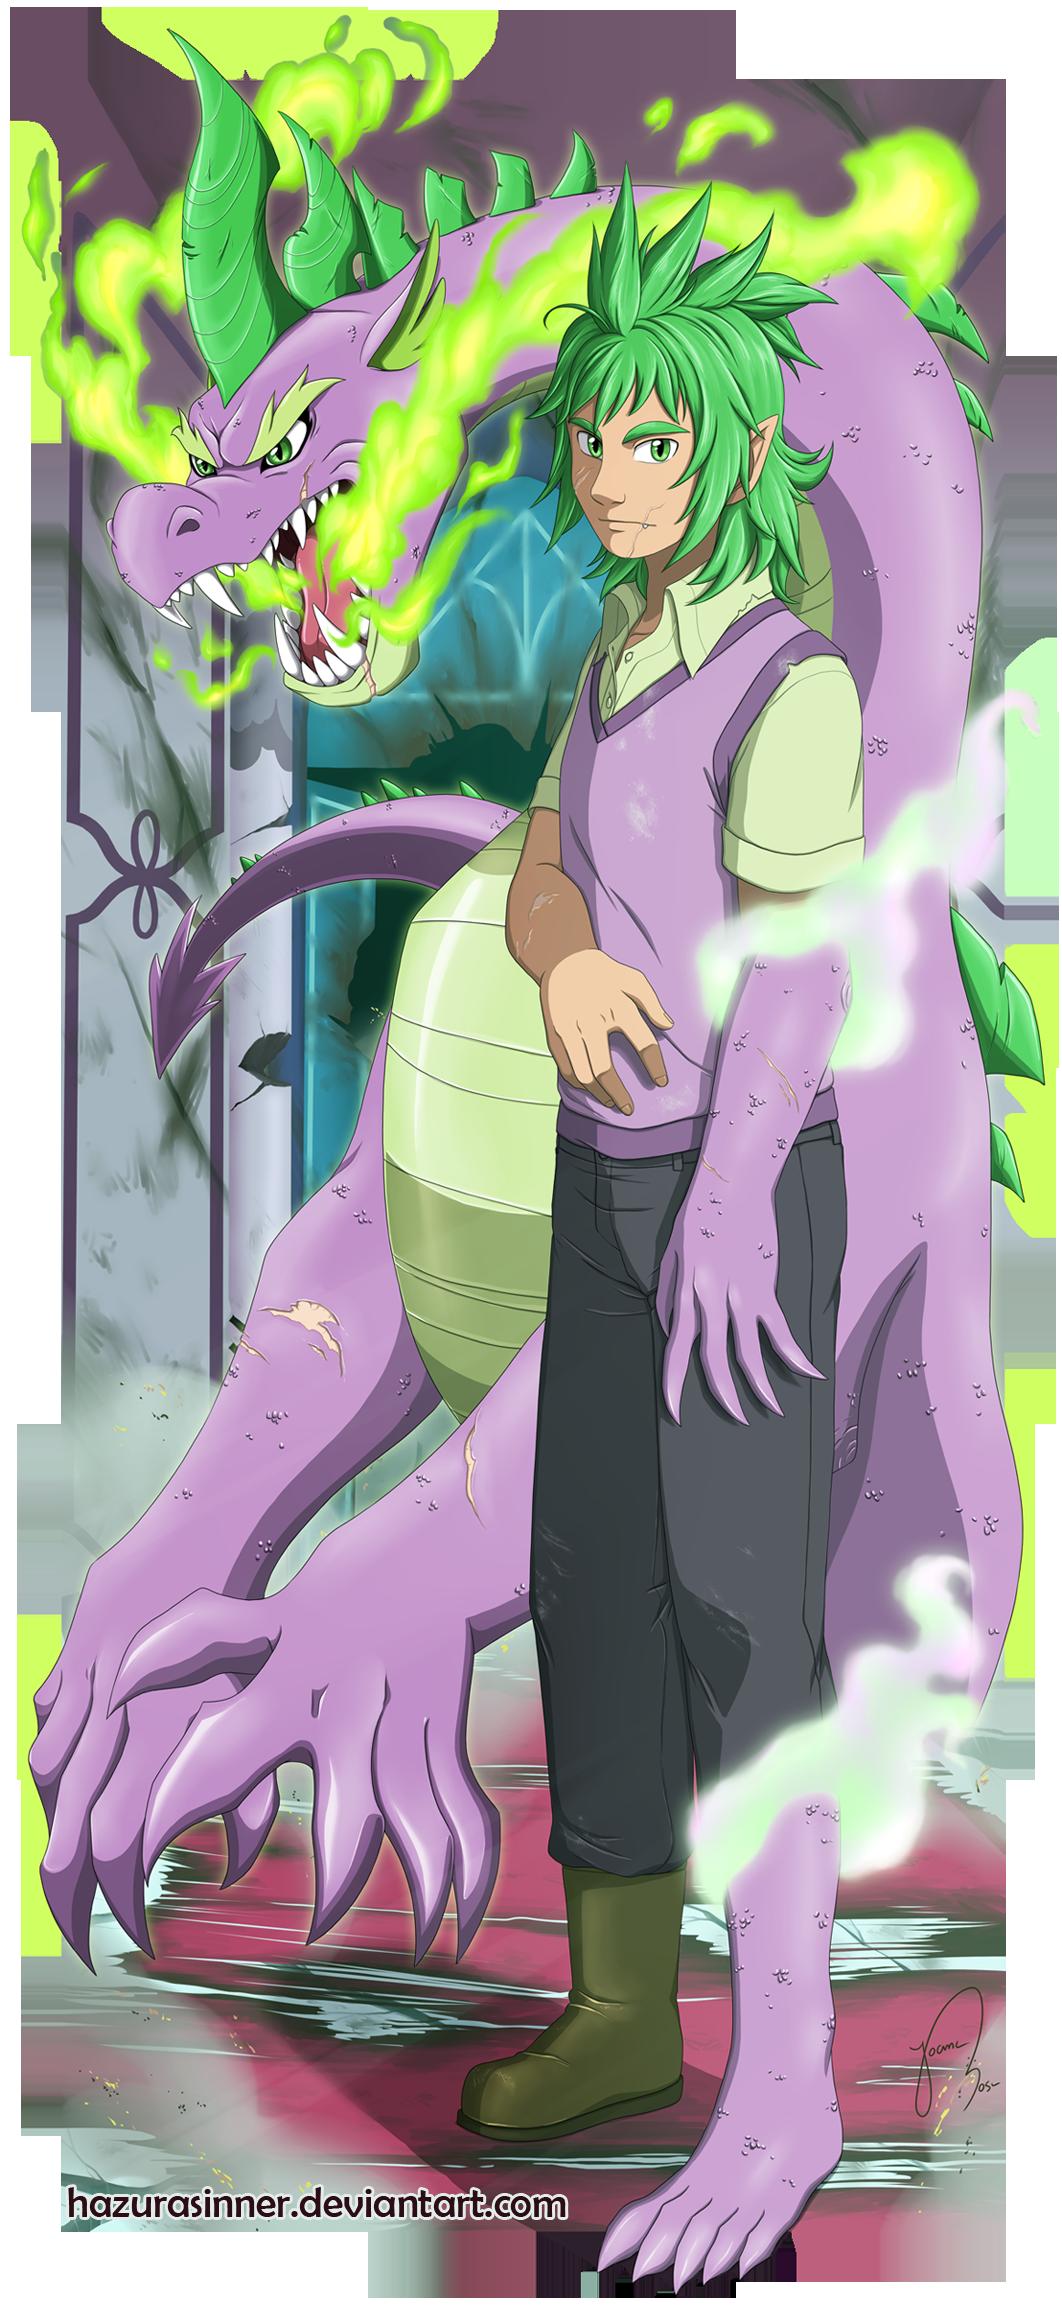 The Dragon Hero by HazuraSinner